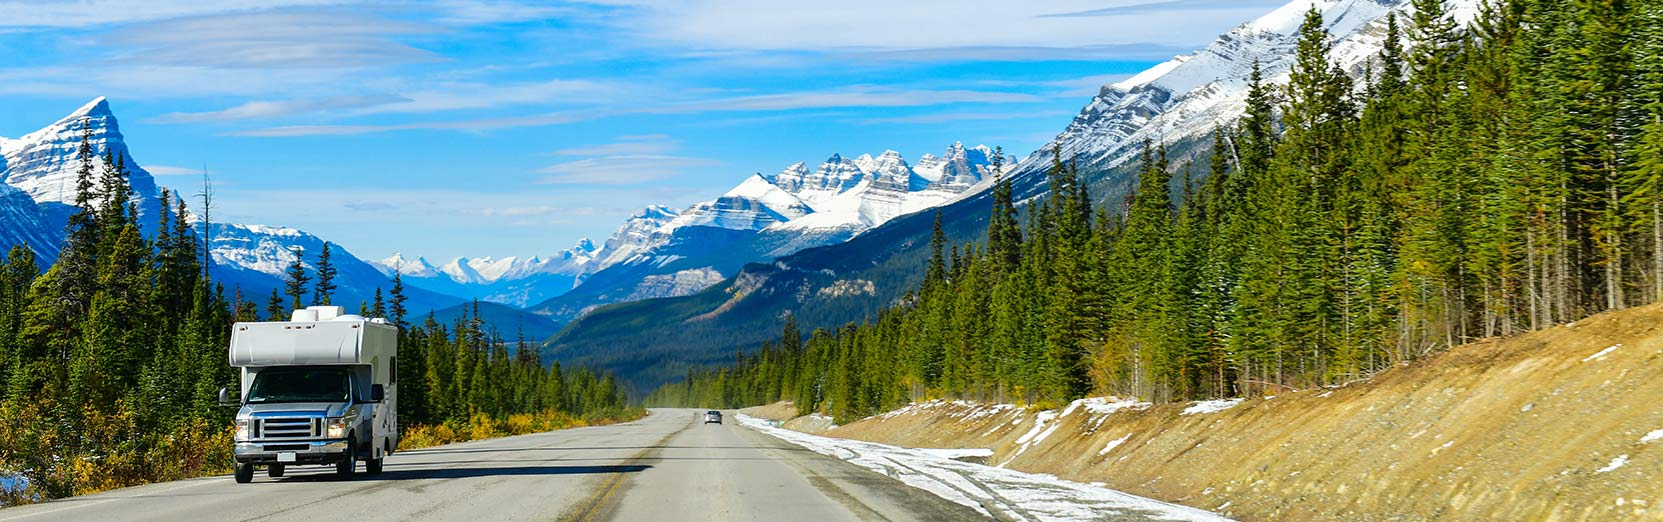 Kanada Roadtrip Checkliste | Sunny Cars Autovermietung